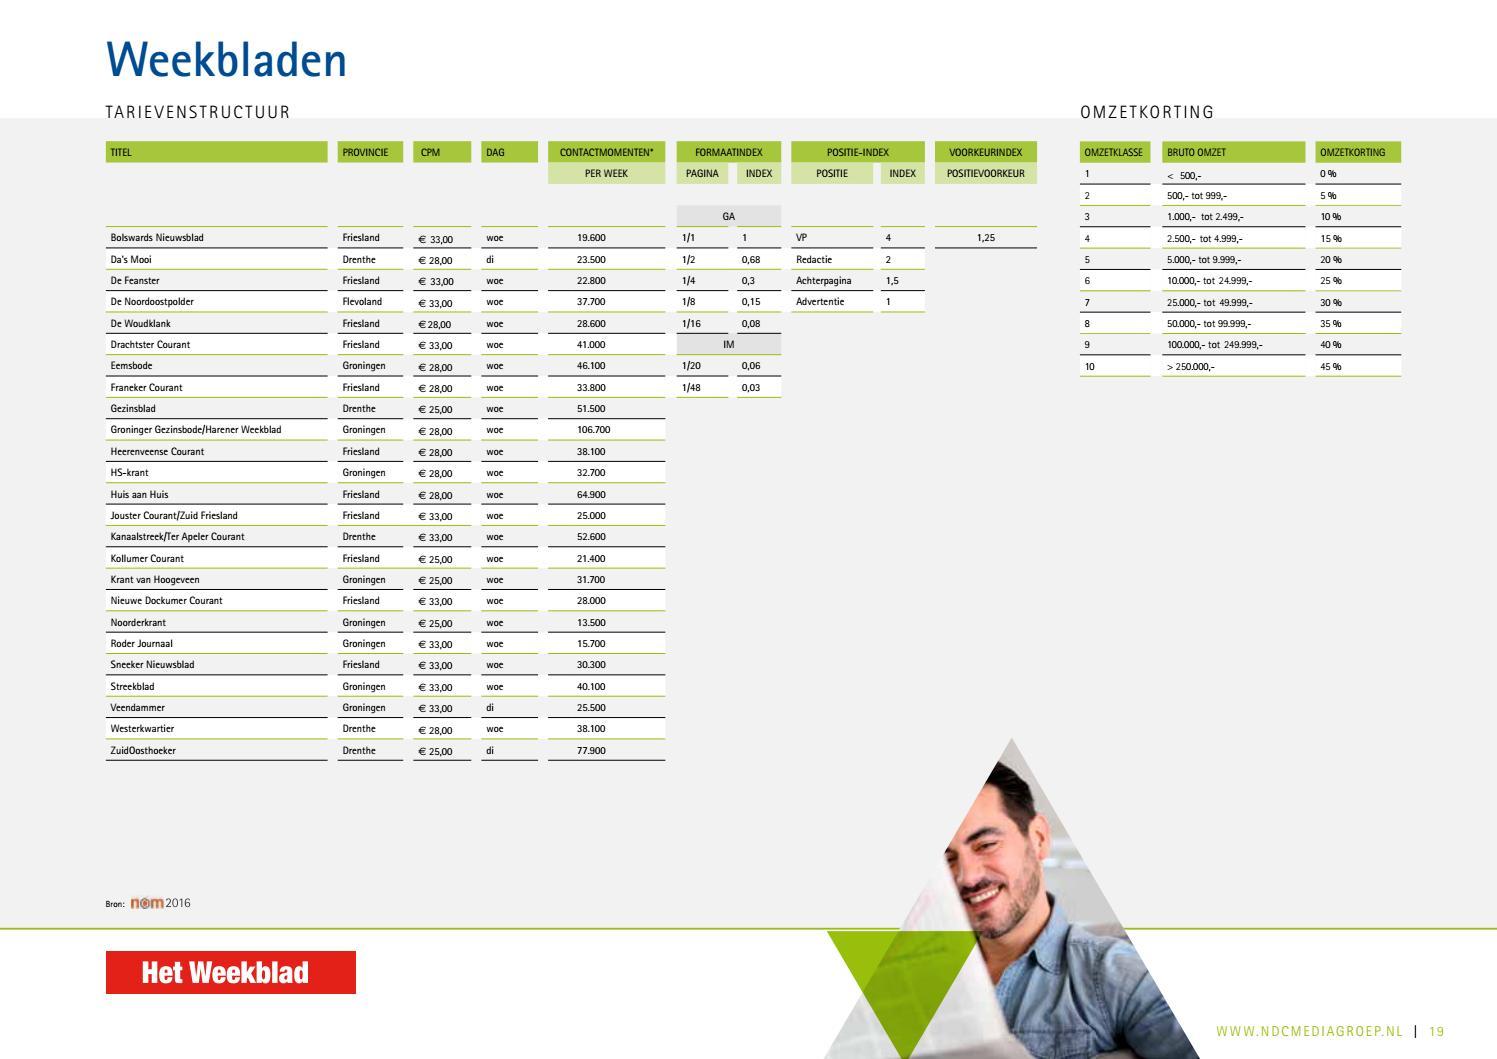 ndc weekbladen tarievenstructuur 2016 by ndc mediagroep